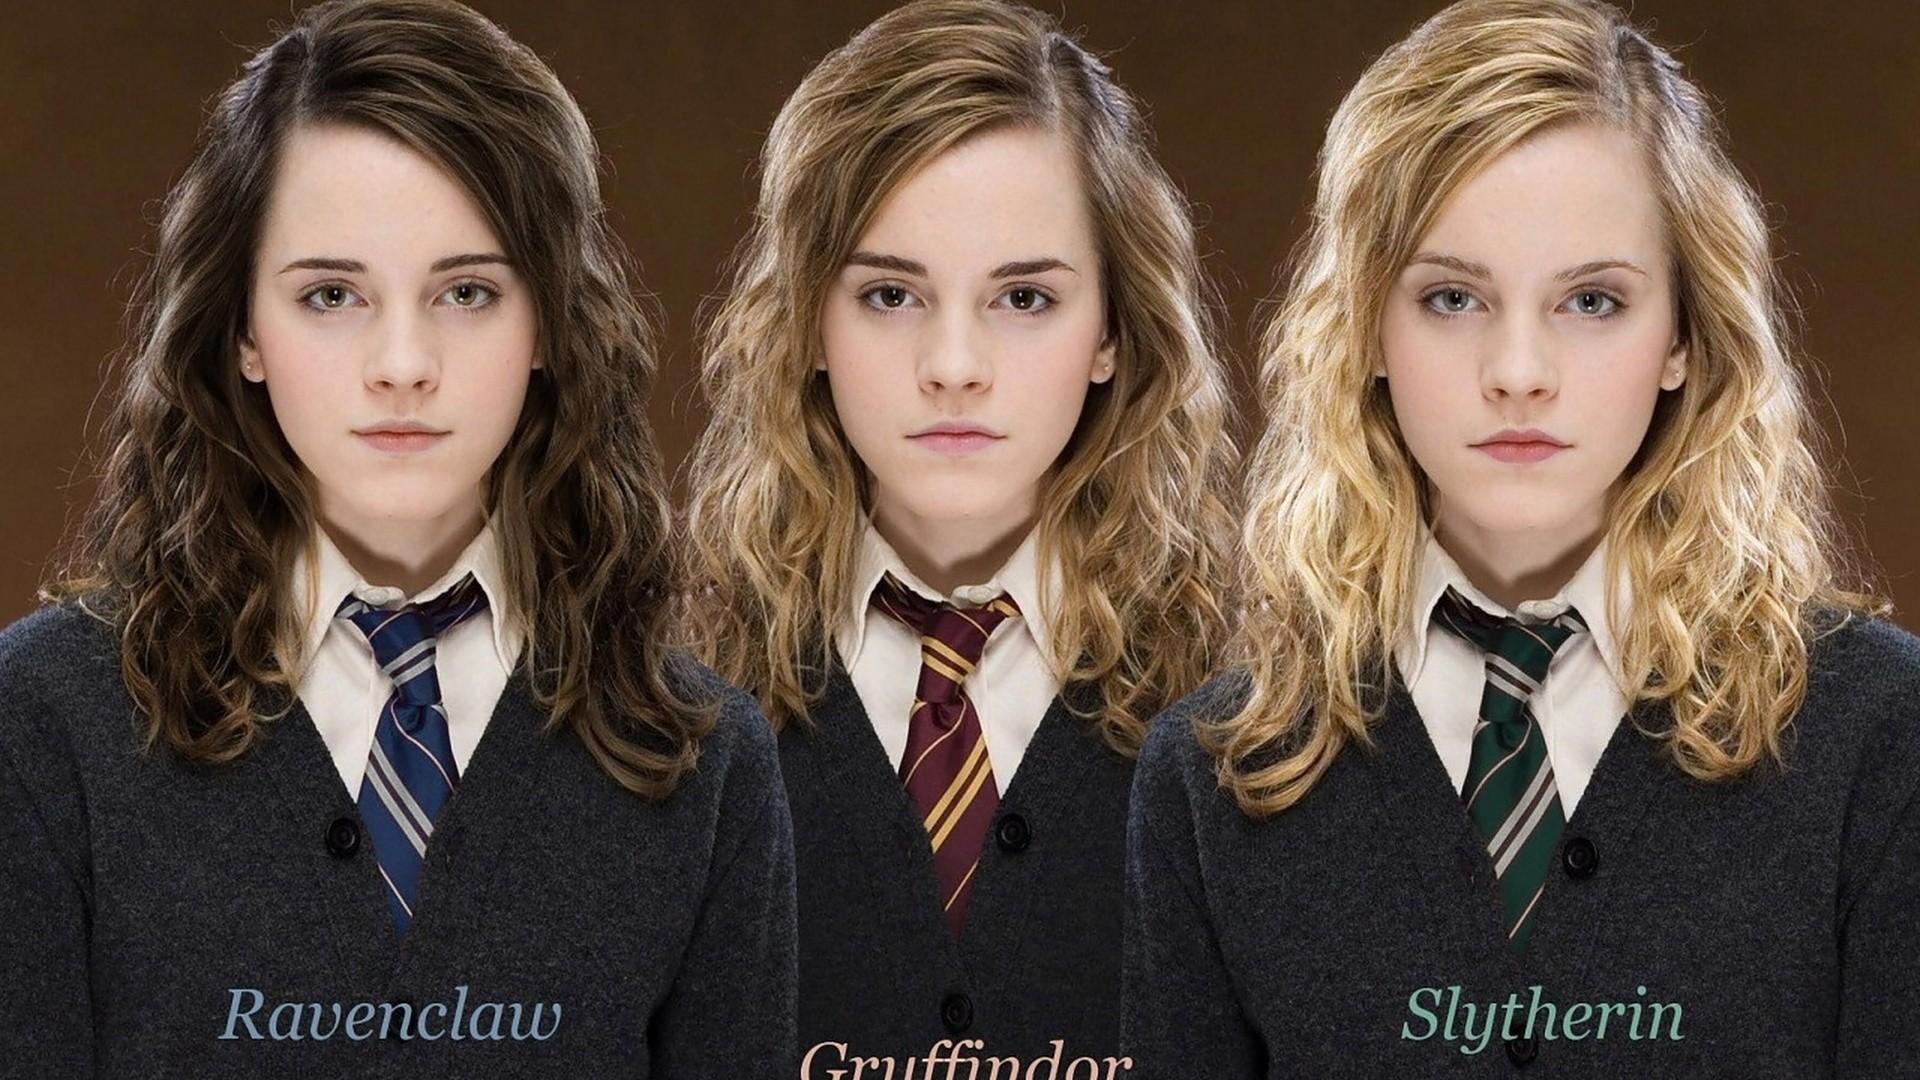 Res: 1920x1080, Ravenclaw, Gryffindor, Emma, Slytherin, Hogwarts, Faculties